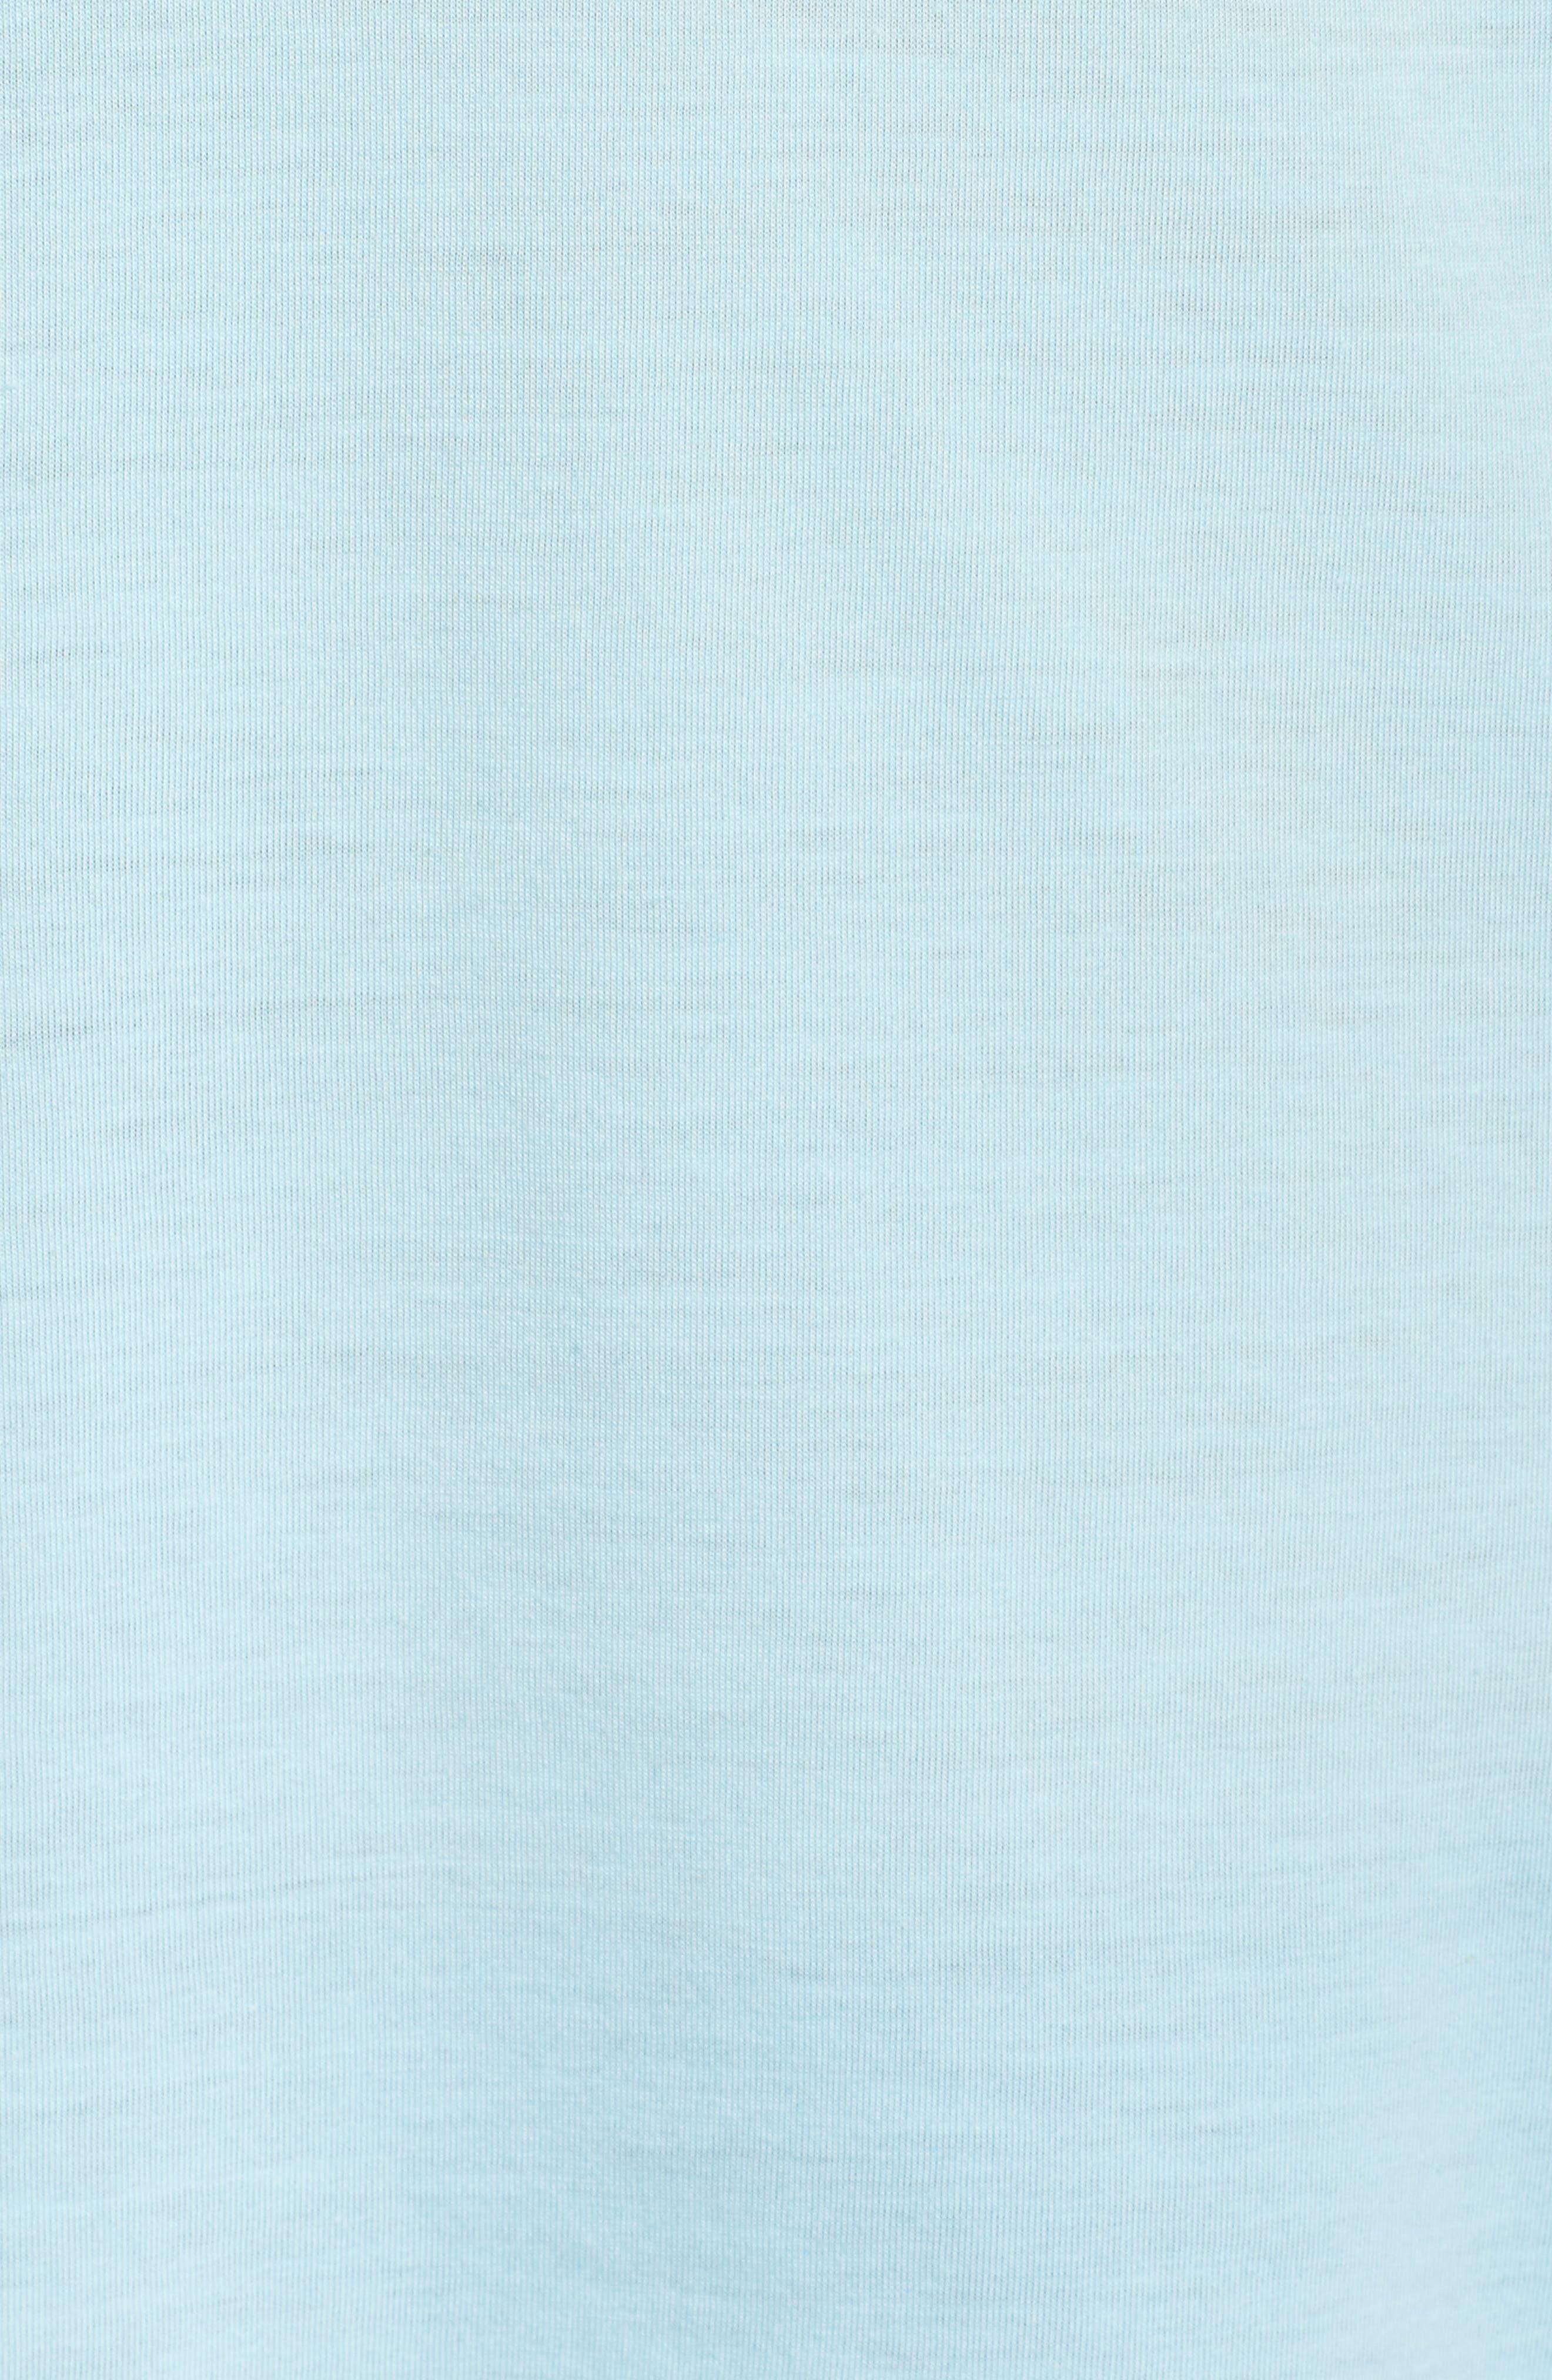 Distance Short Sleeve Tee,                             Alternate thumbnail 6, color,                             Pool/ Ocean Run Happy Smile